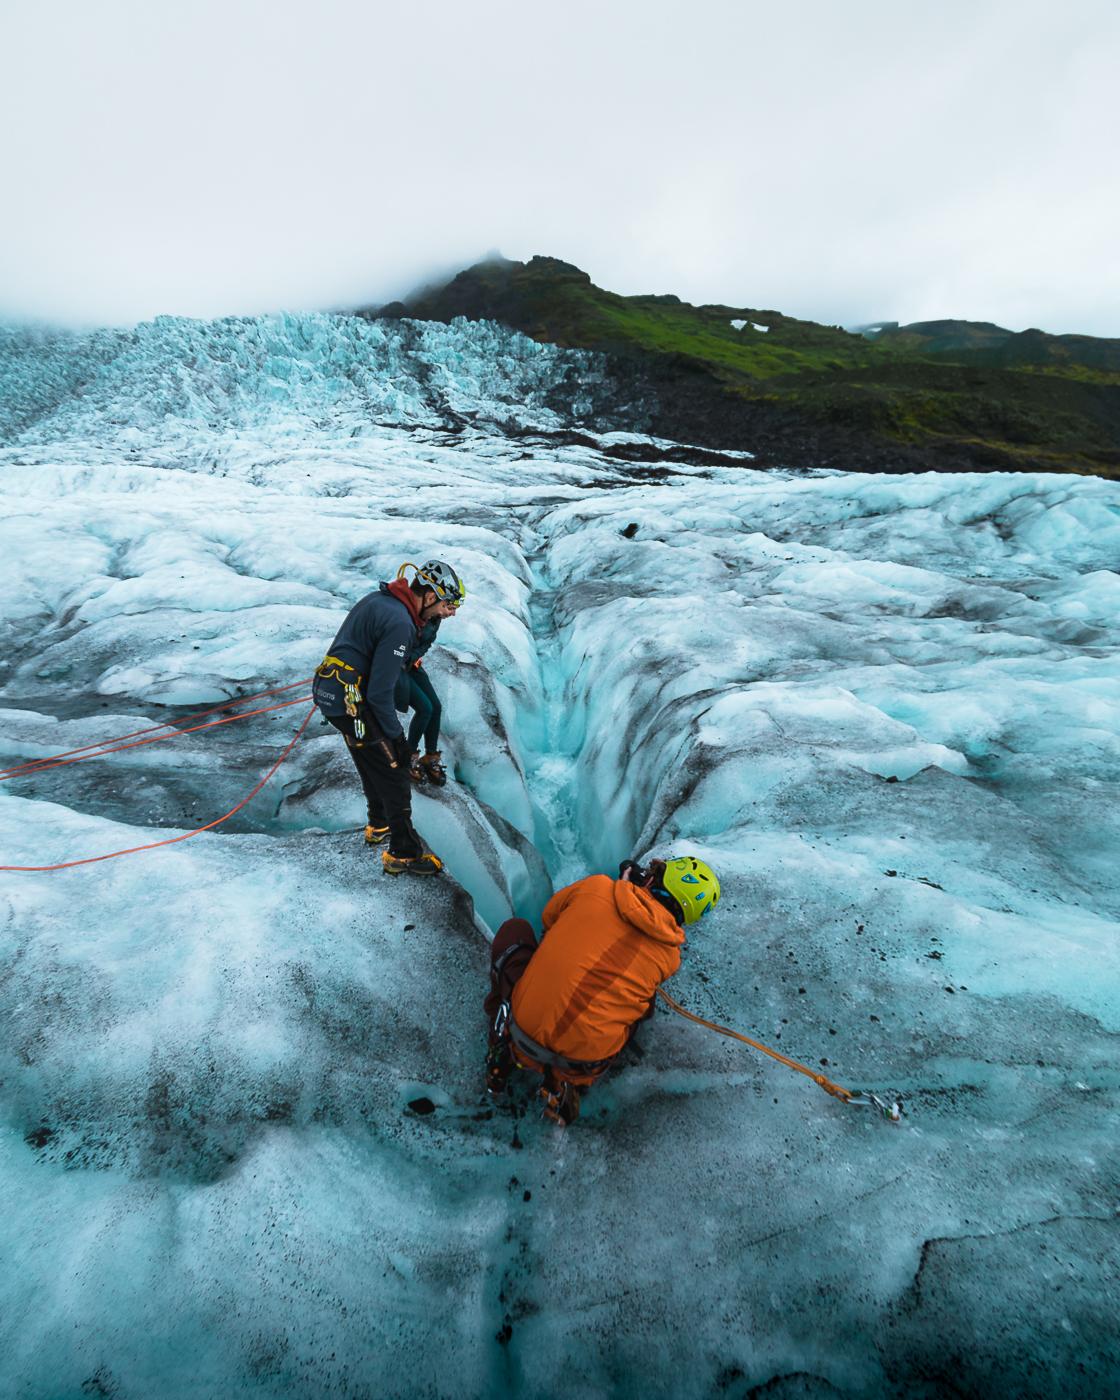 gabornagy_photography_iceland_glacier18.jpg